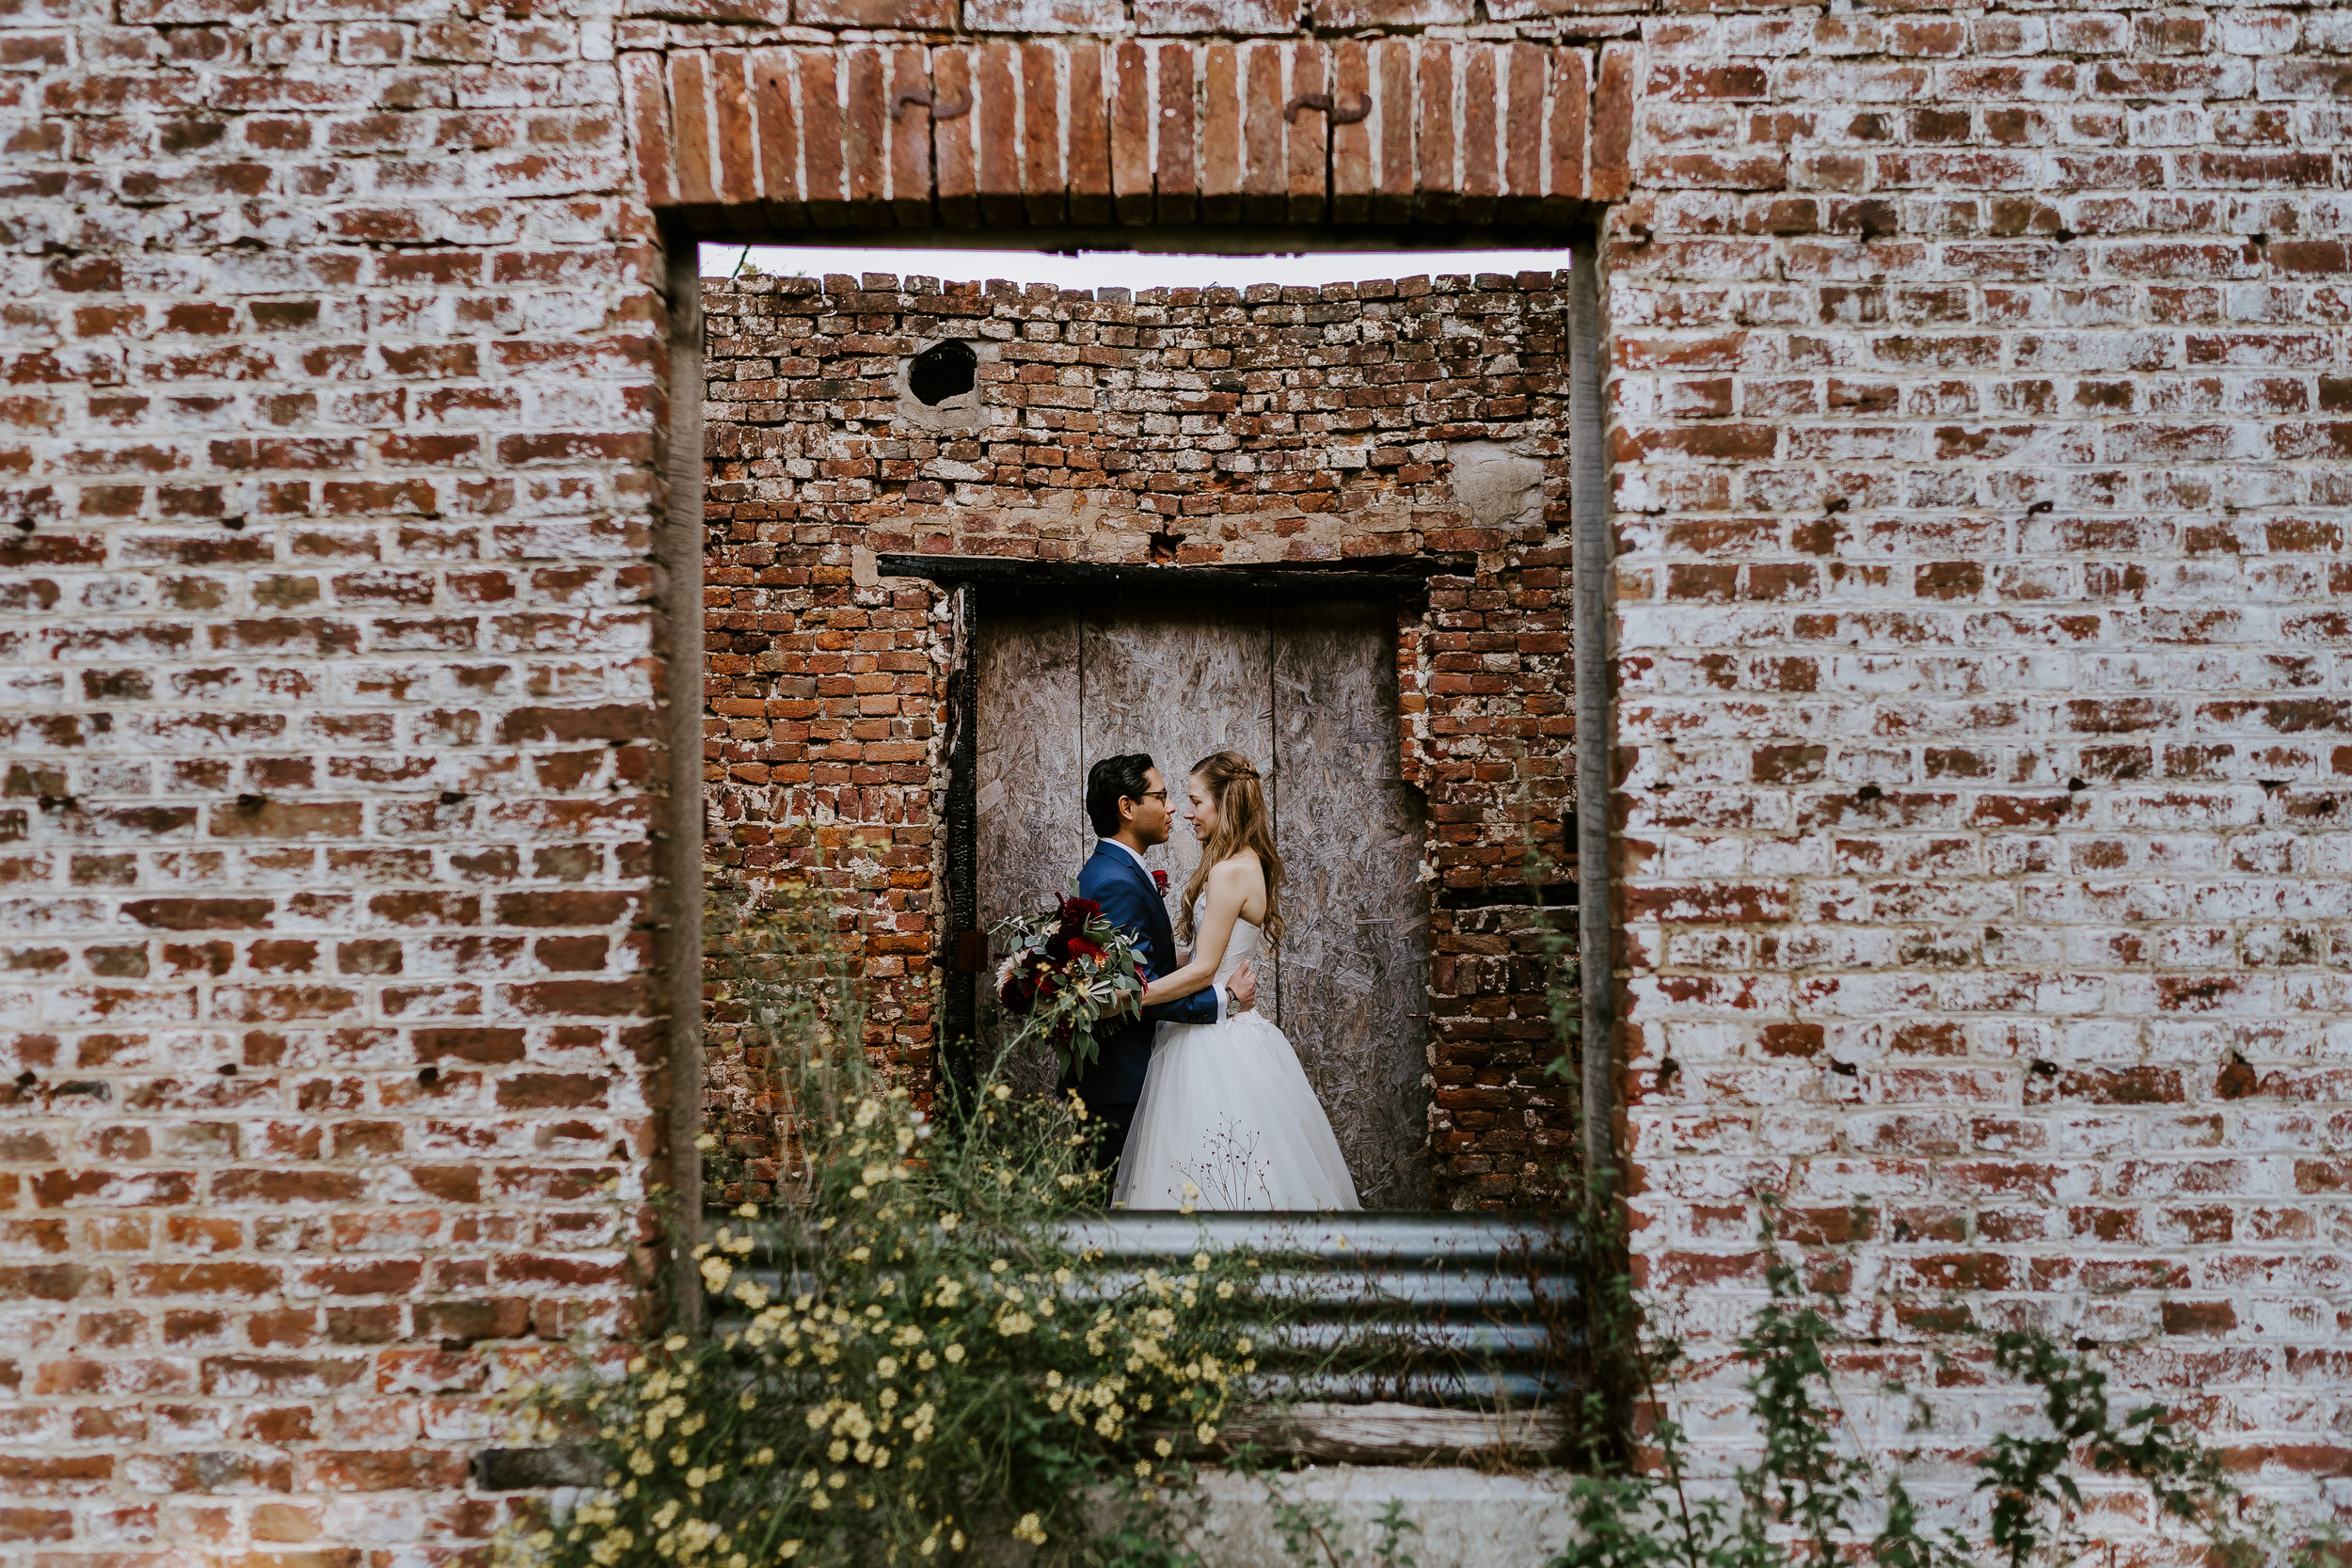 bruiloft-altembrouck-overthemoonweddings25.jpg